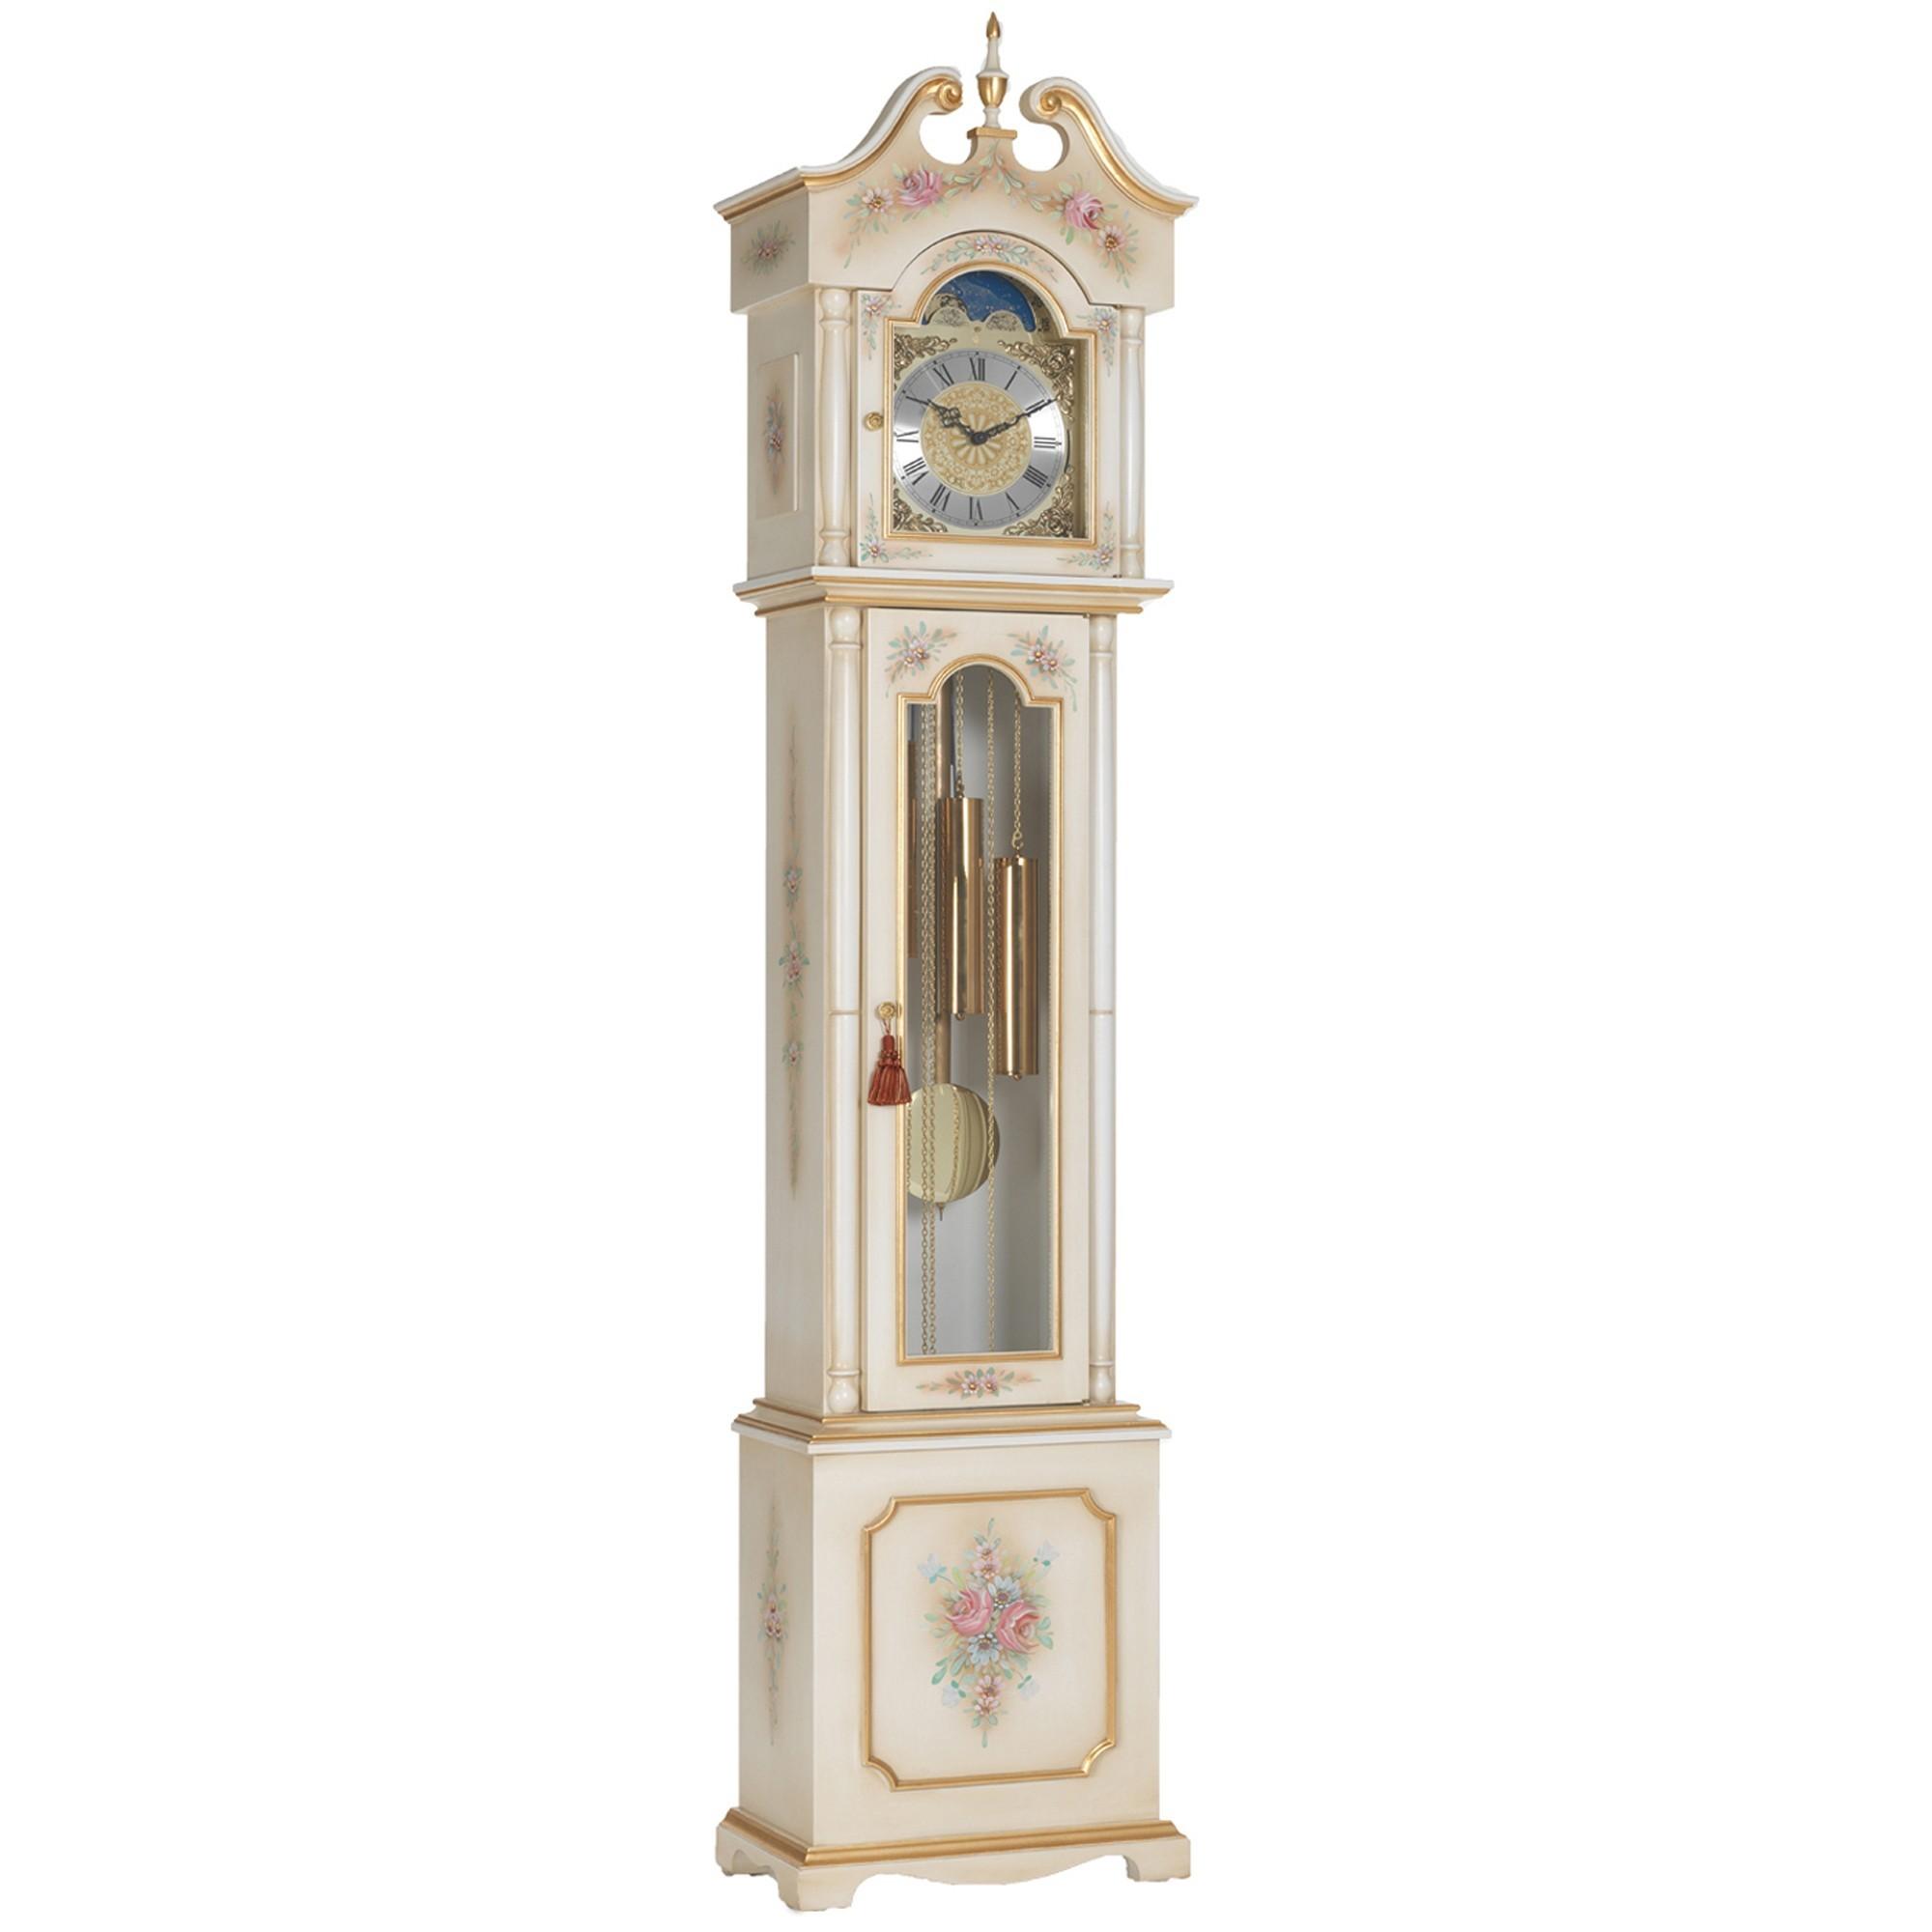 venetian white u0026 antico gold grandfather clock - Grandfather Clocks